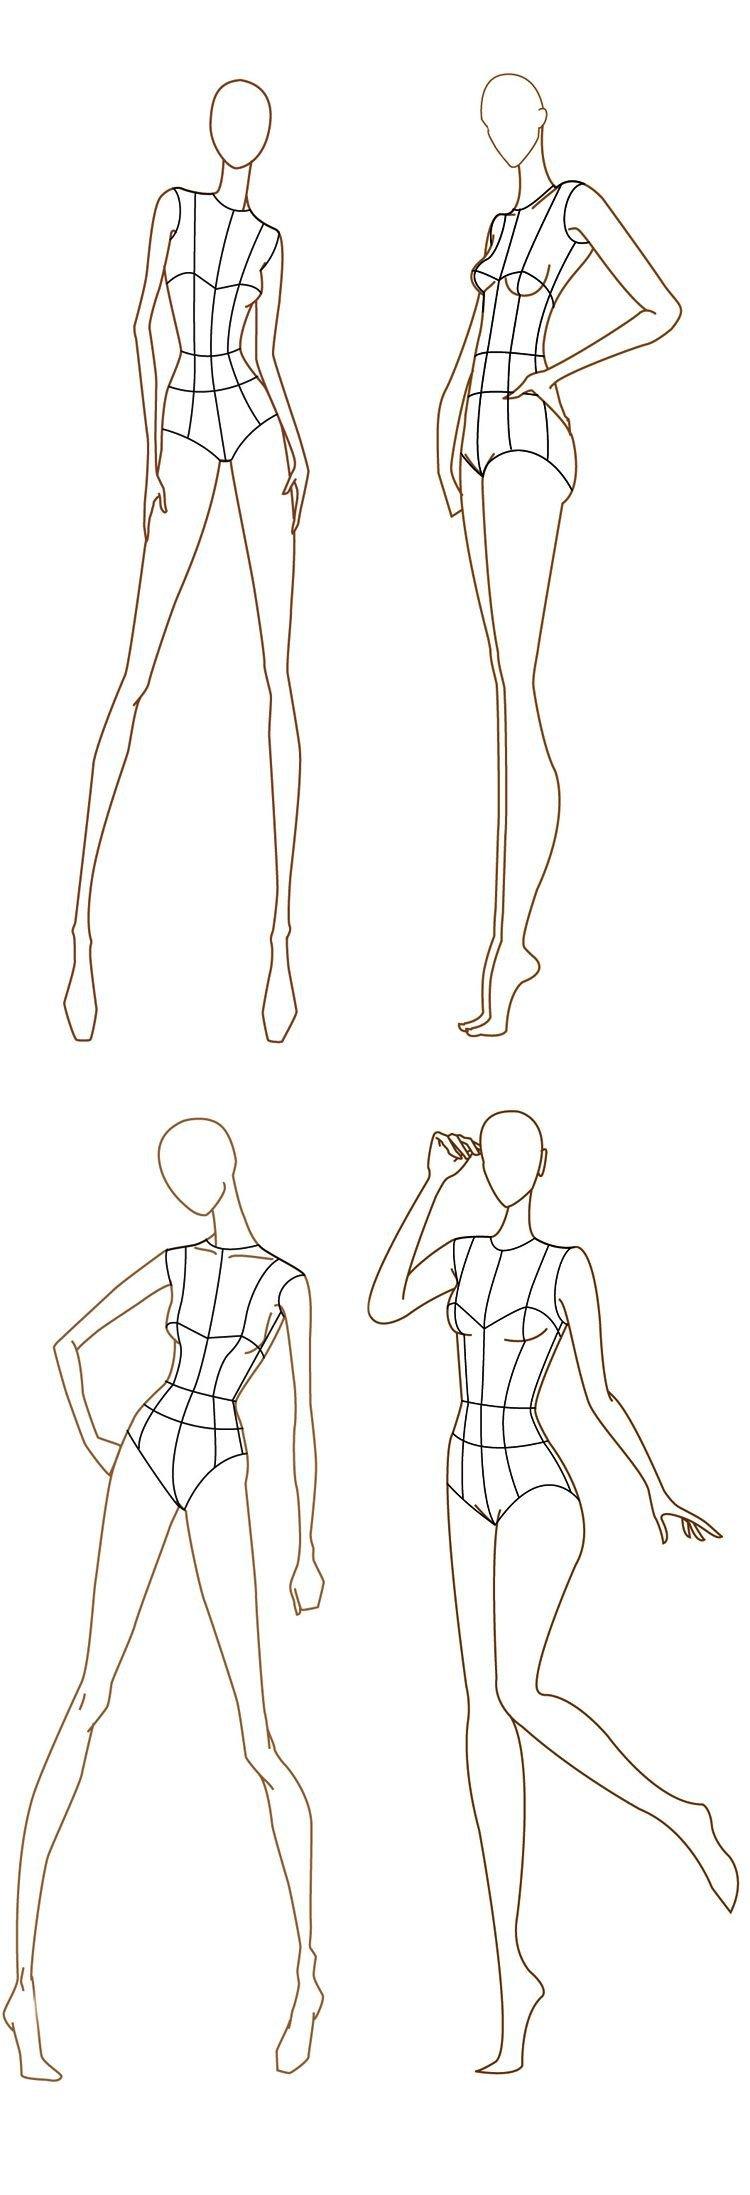 Fashion Design Templates to Print Free Fashion Design Templates More Here